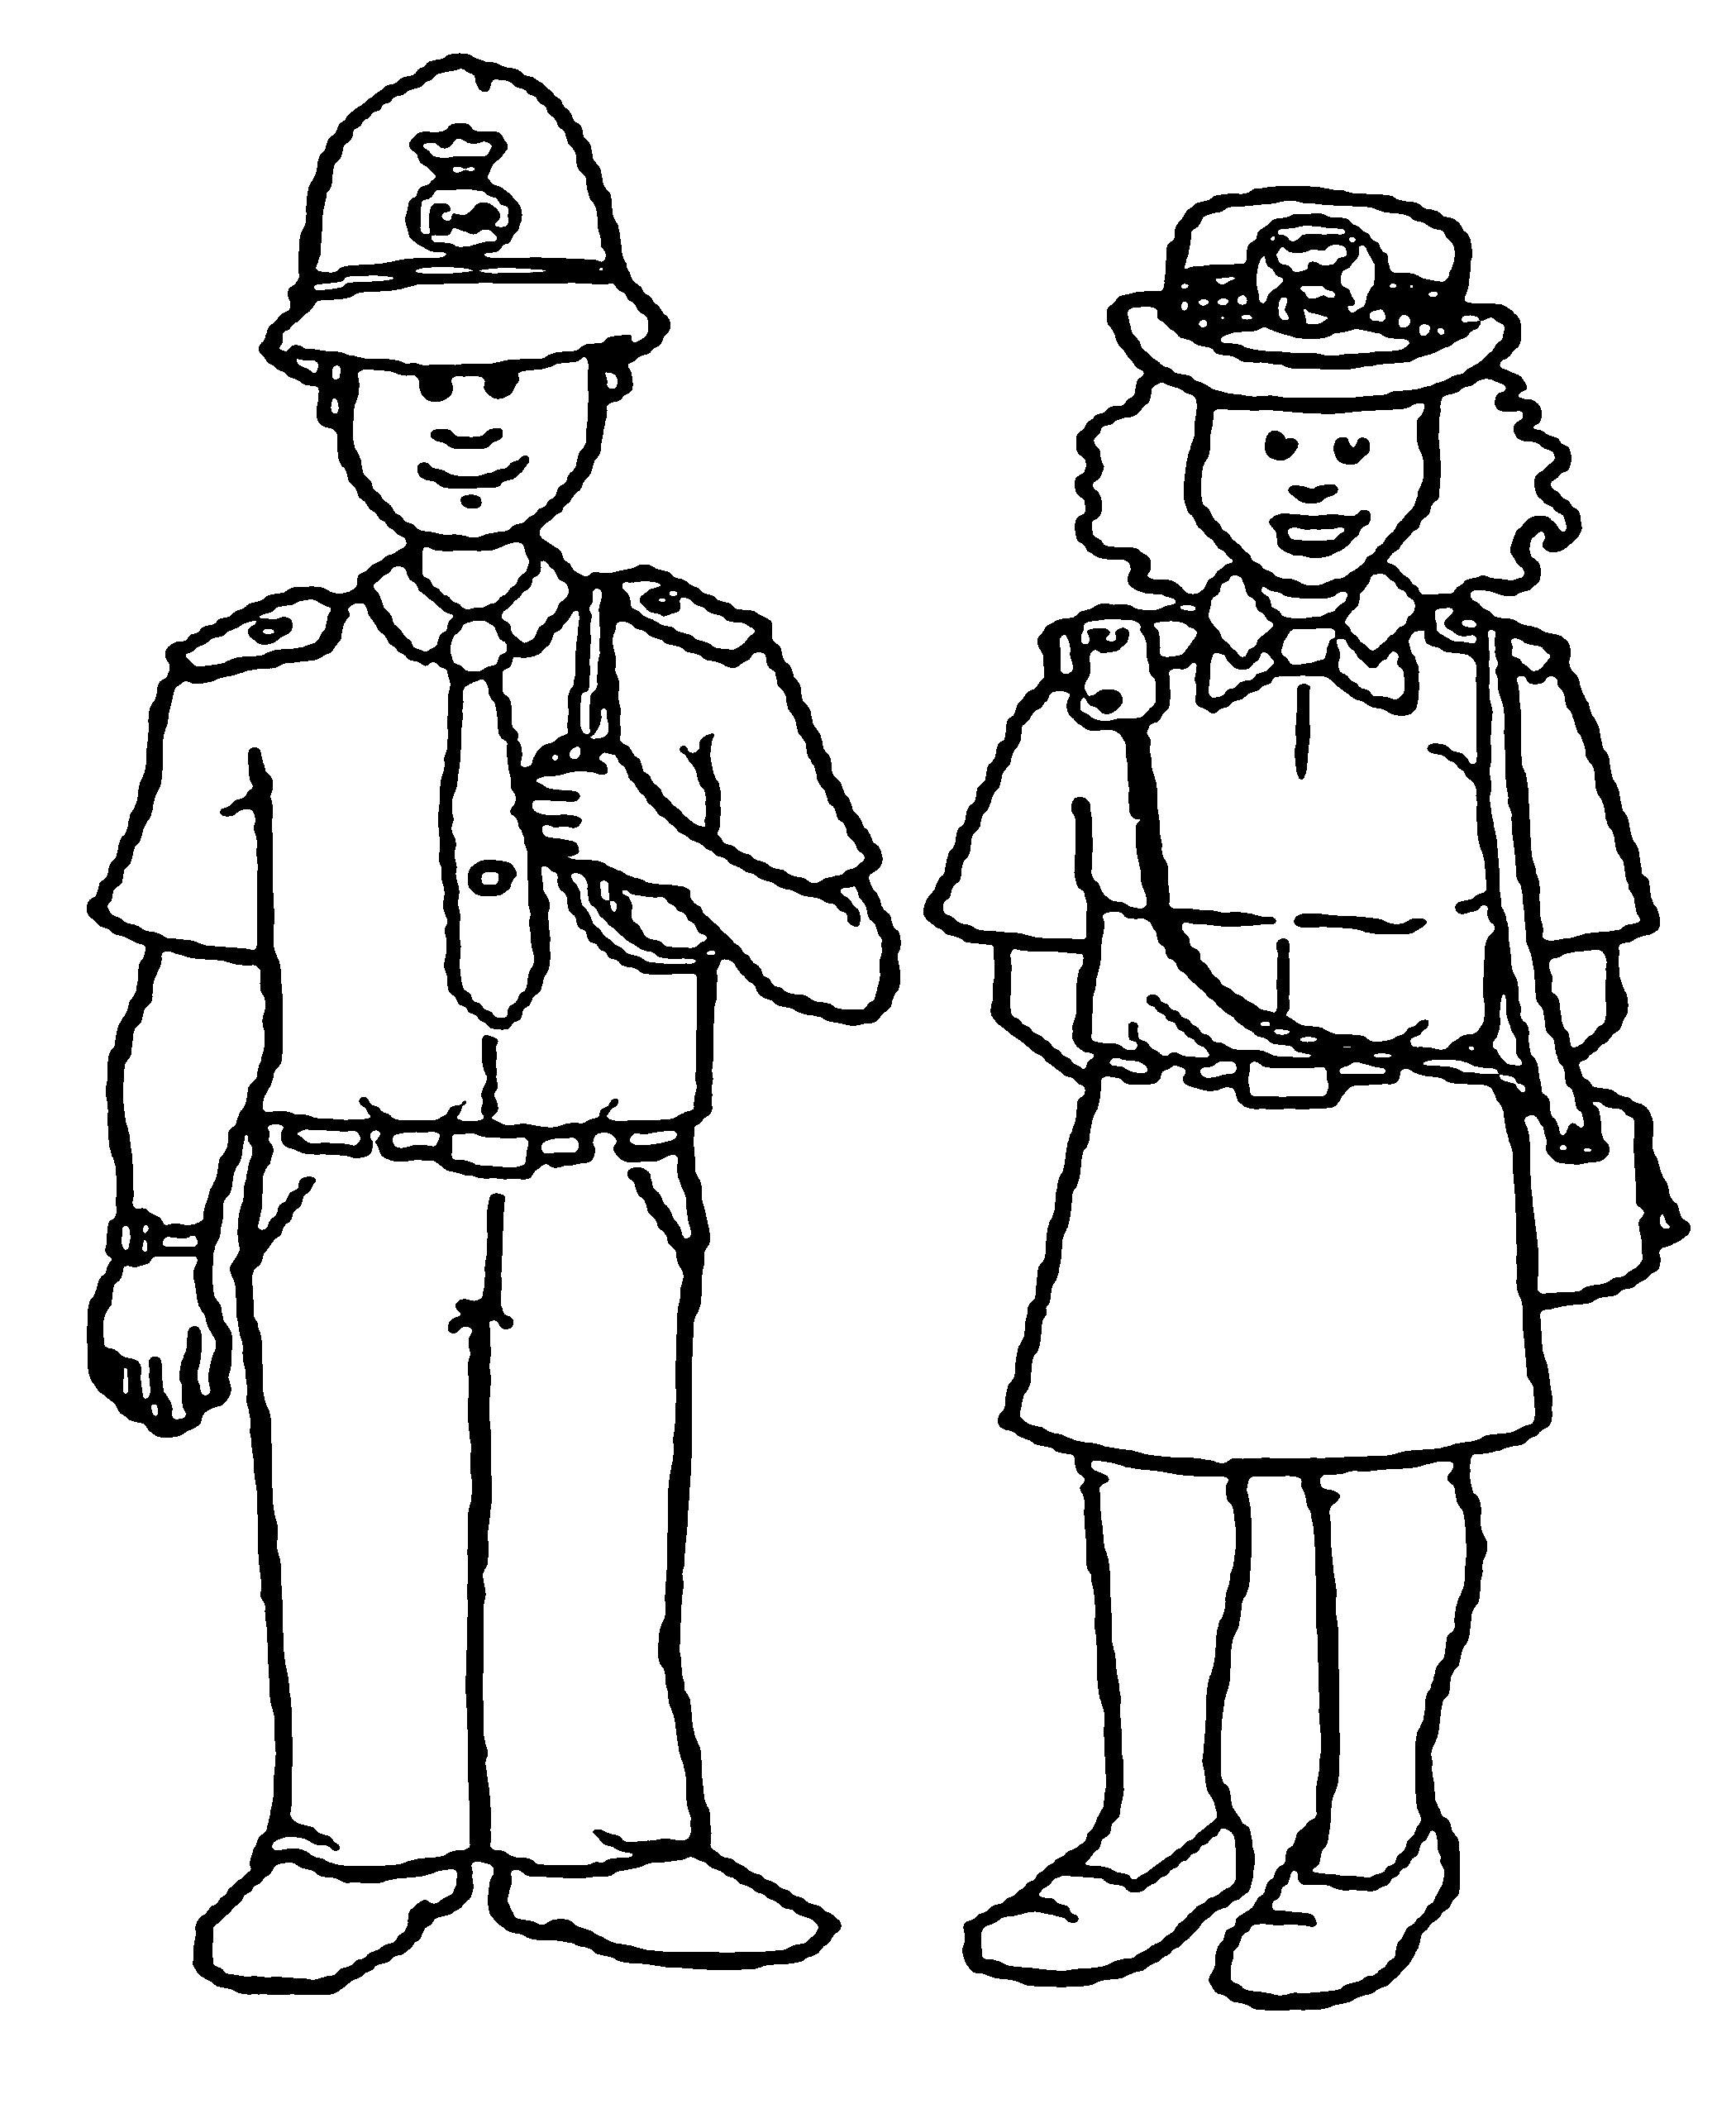 Gambar Policia Para Colorear Best Policia Para Colorear Jpeg Png Gif ...